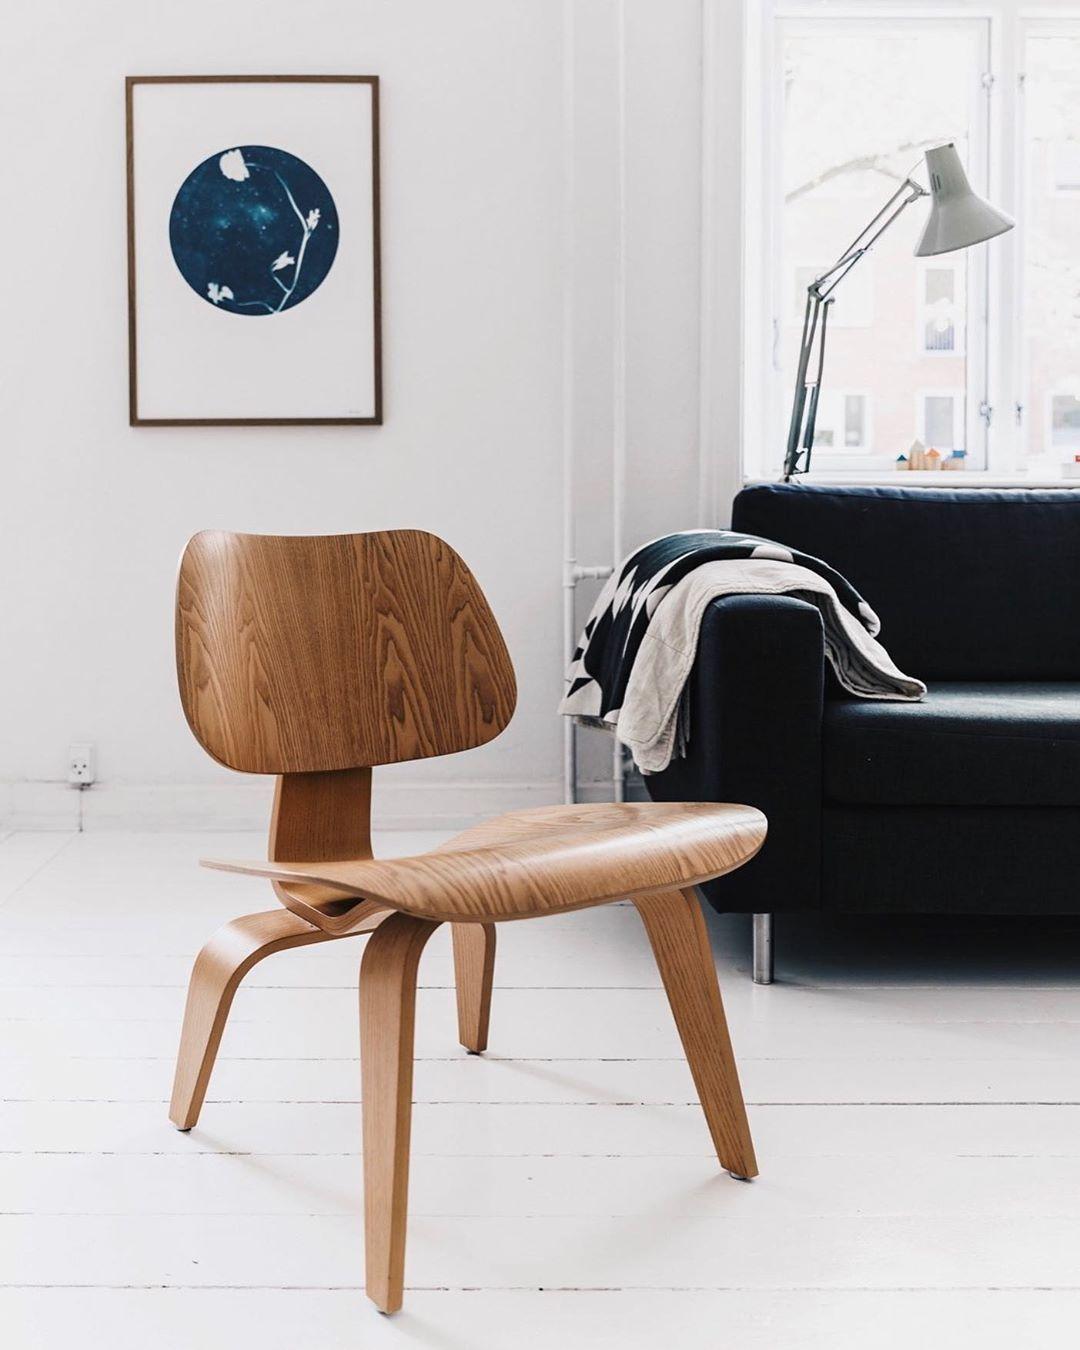 Eames® Molded Plywood Dining Chair - Wood Base | Eames molded plywood  dining chair, Eames chair living room, Eames plywood chair- dunyanin-en-unlu-sandalyeleri-ve-hikayelerini-okumak-icin